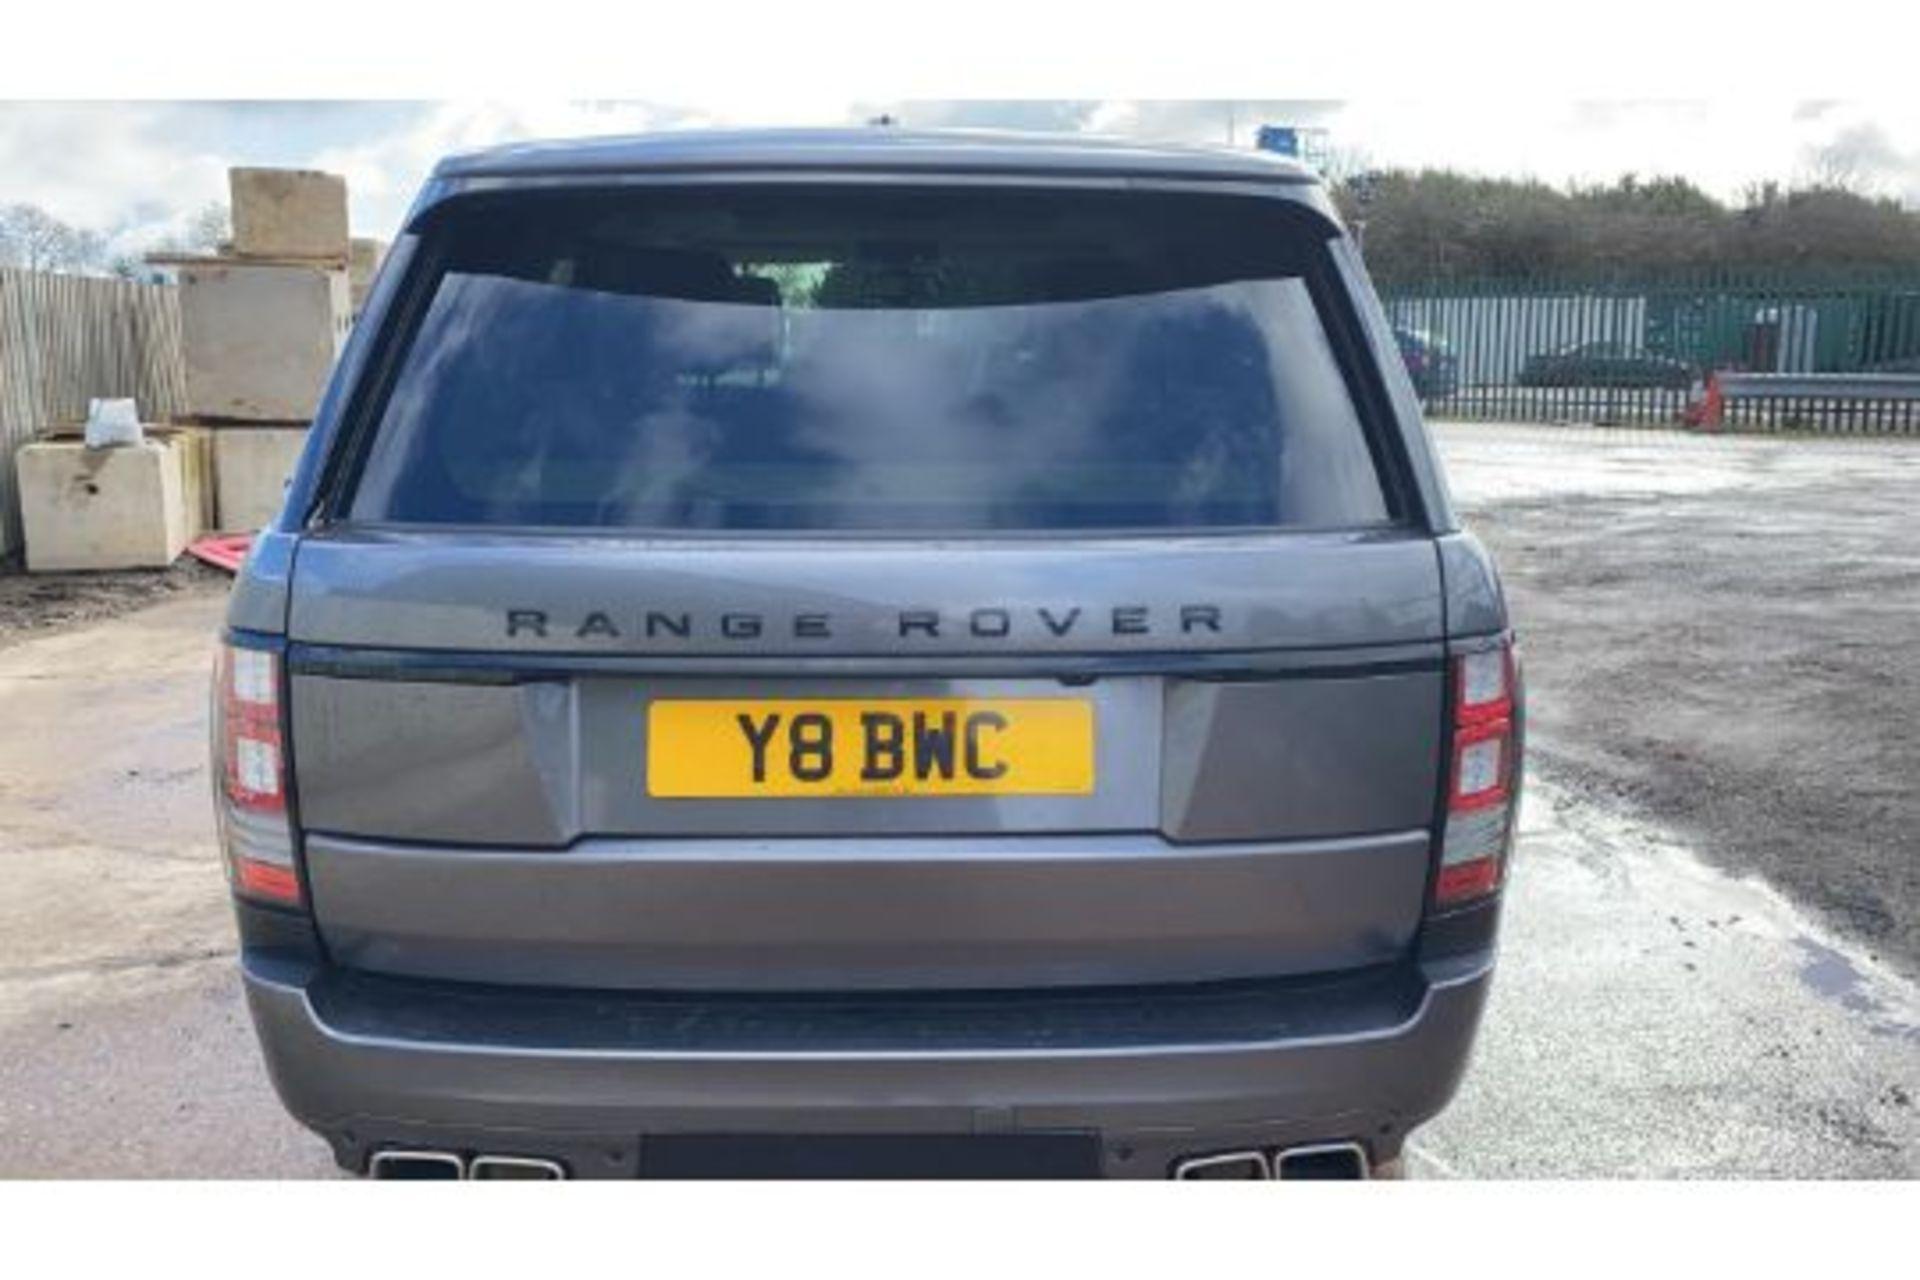 Range Rover Vogue 3.0 TDV6 SE Auto - Black Pack - NEW SHAPE - FULLY LOADED - Pan Roof - Image 4 of 30